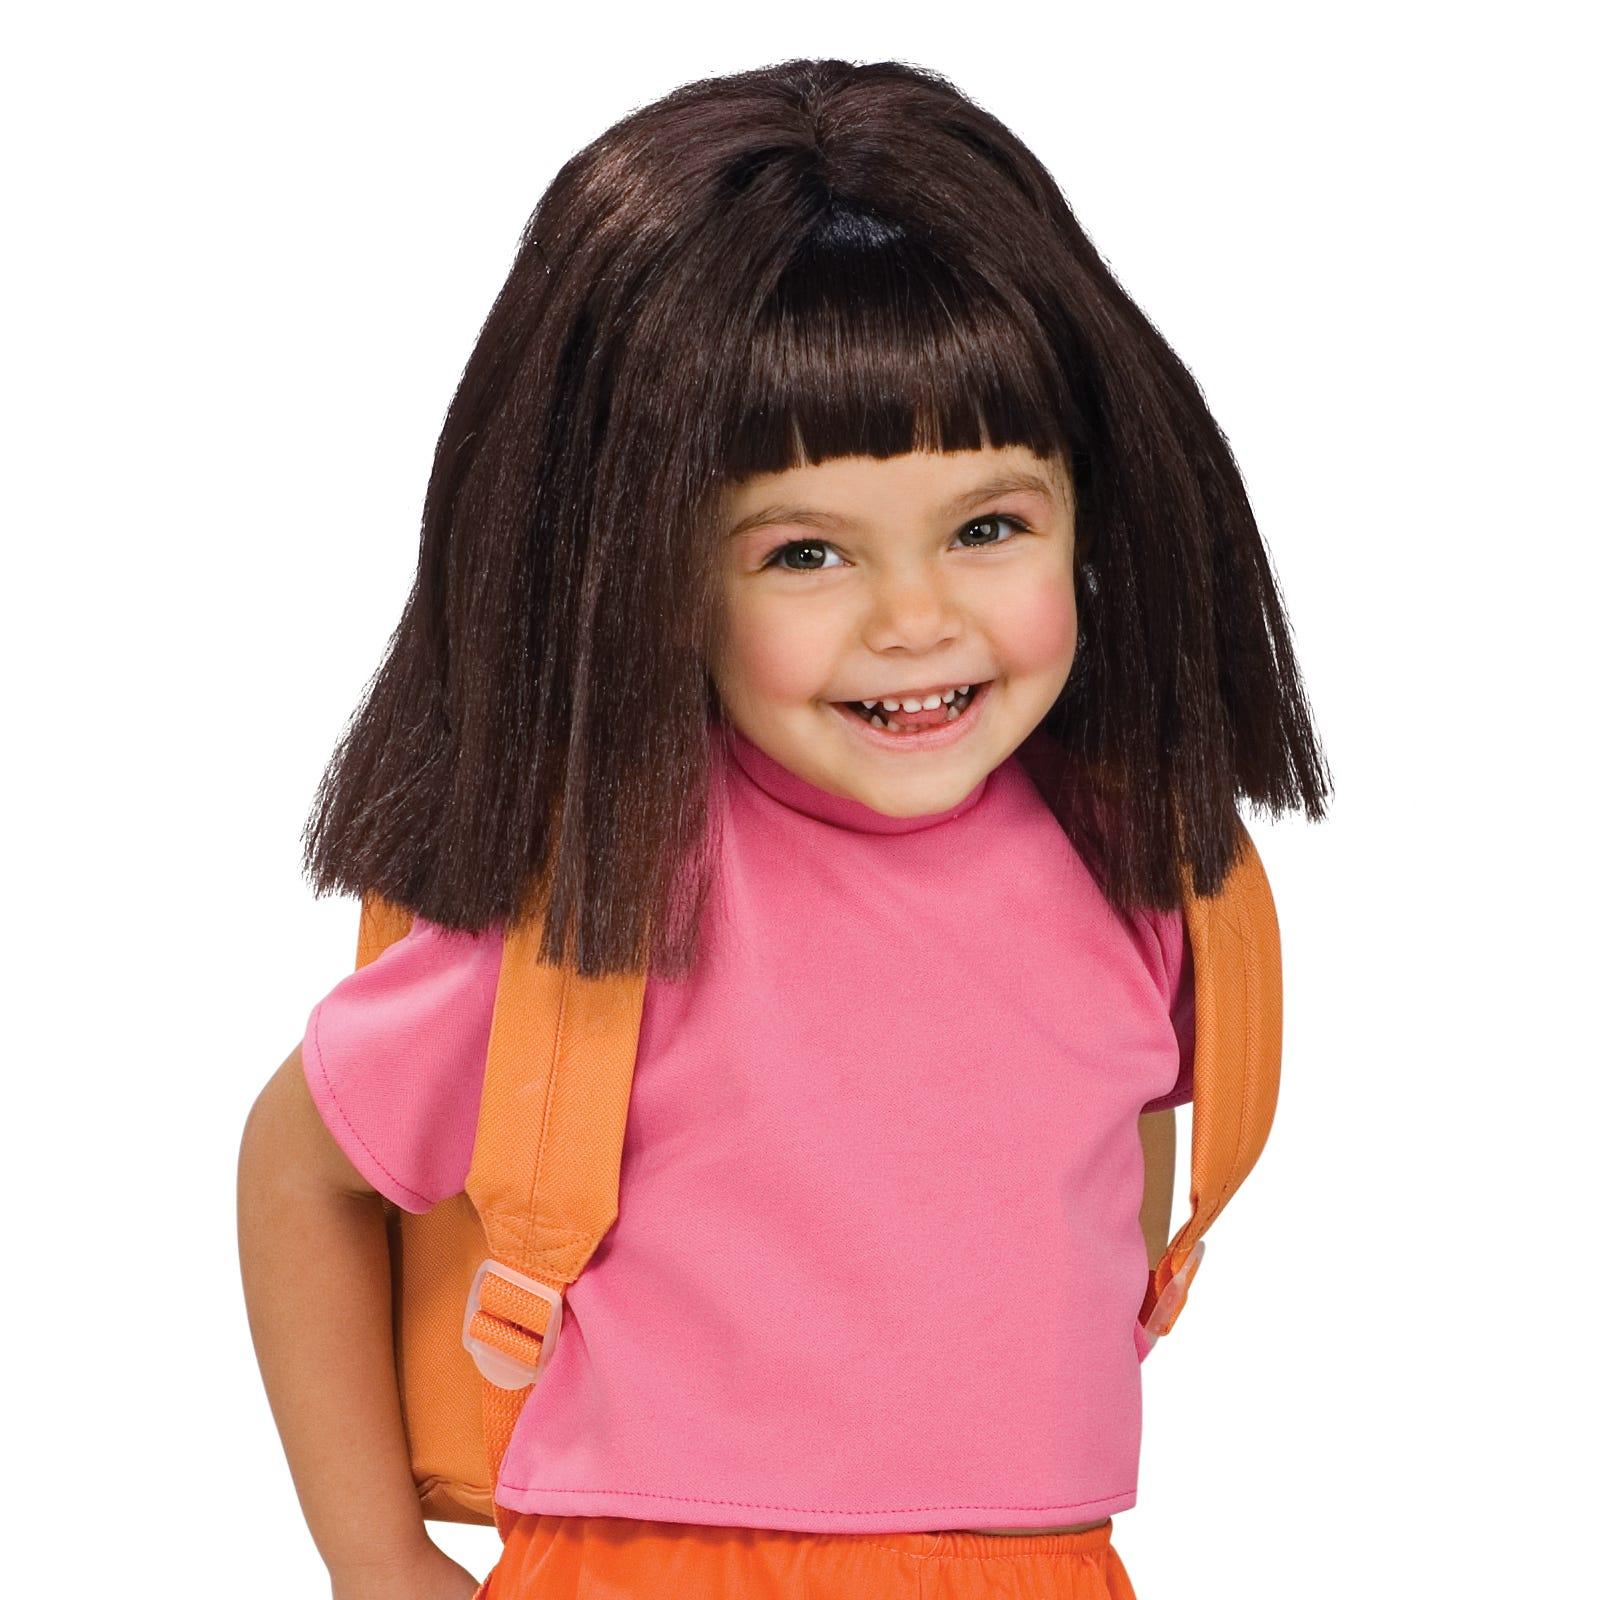 licensed dora the explorer wig girls child cute fancy dress up